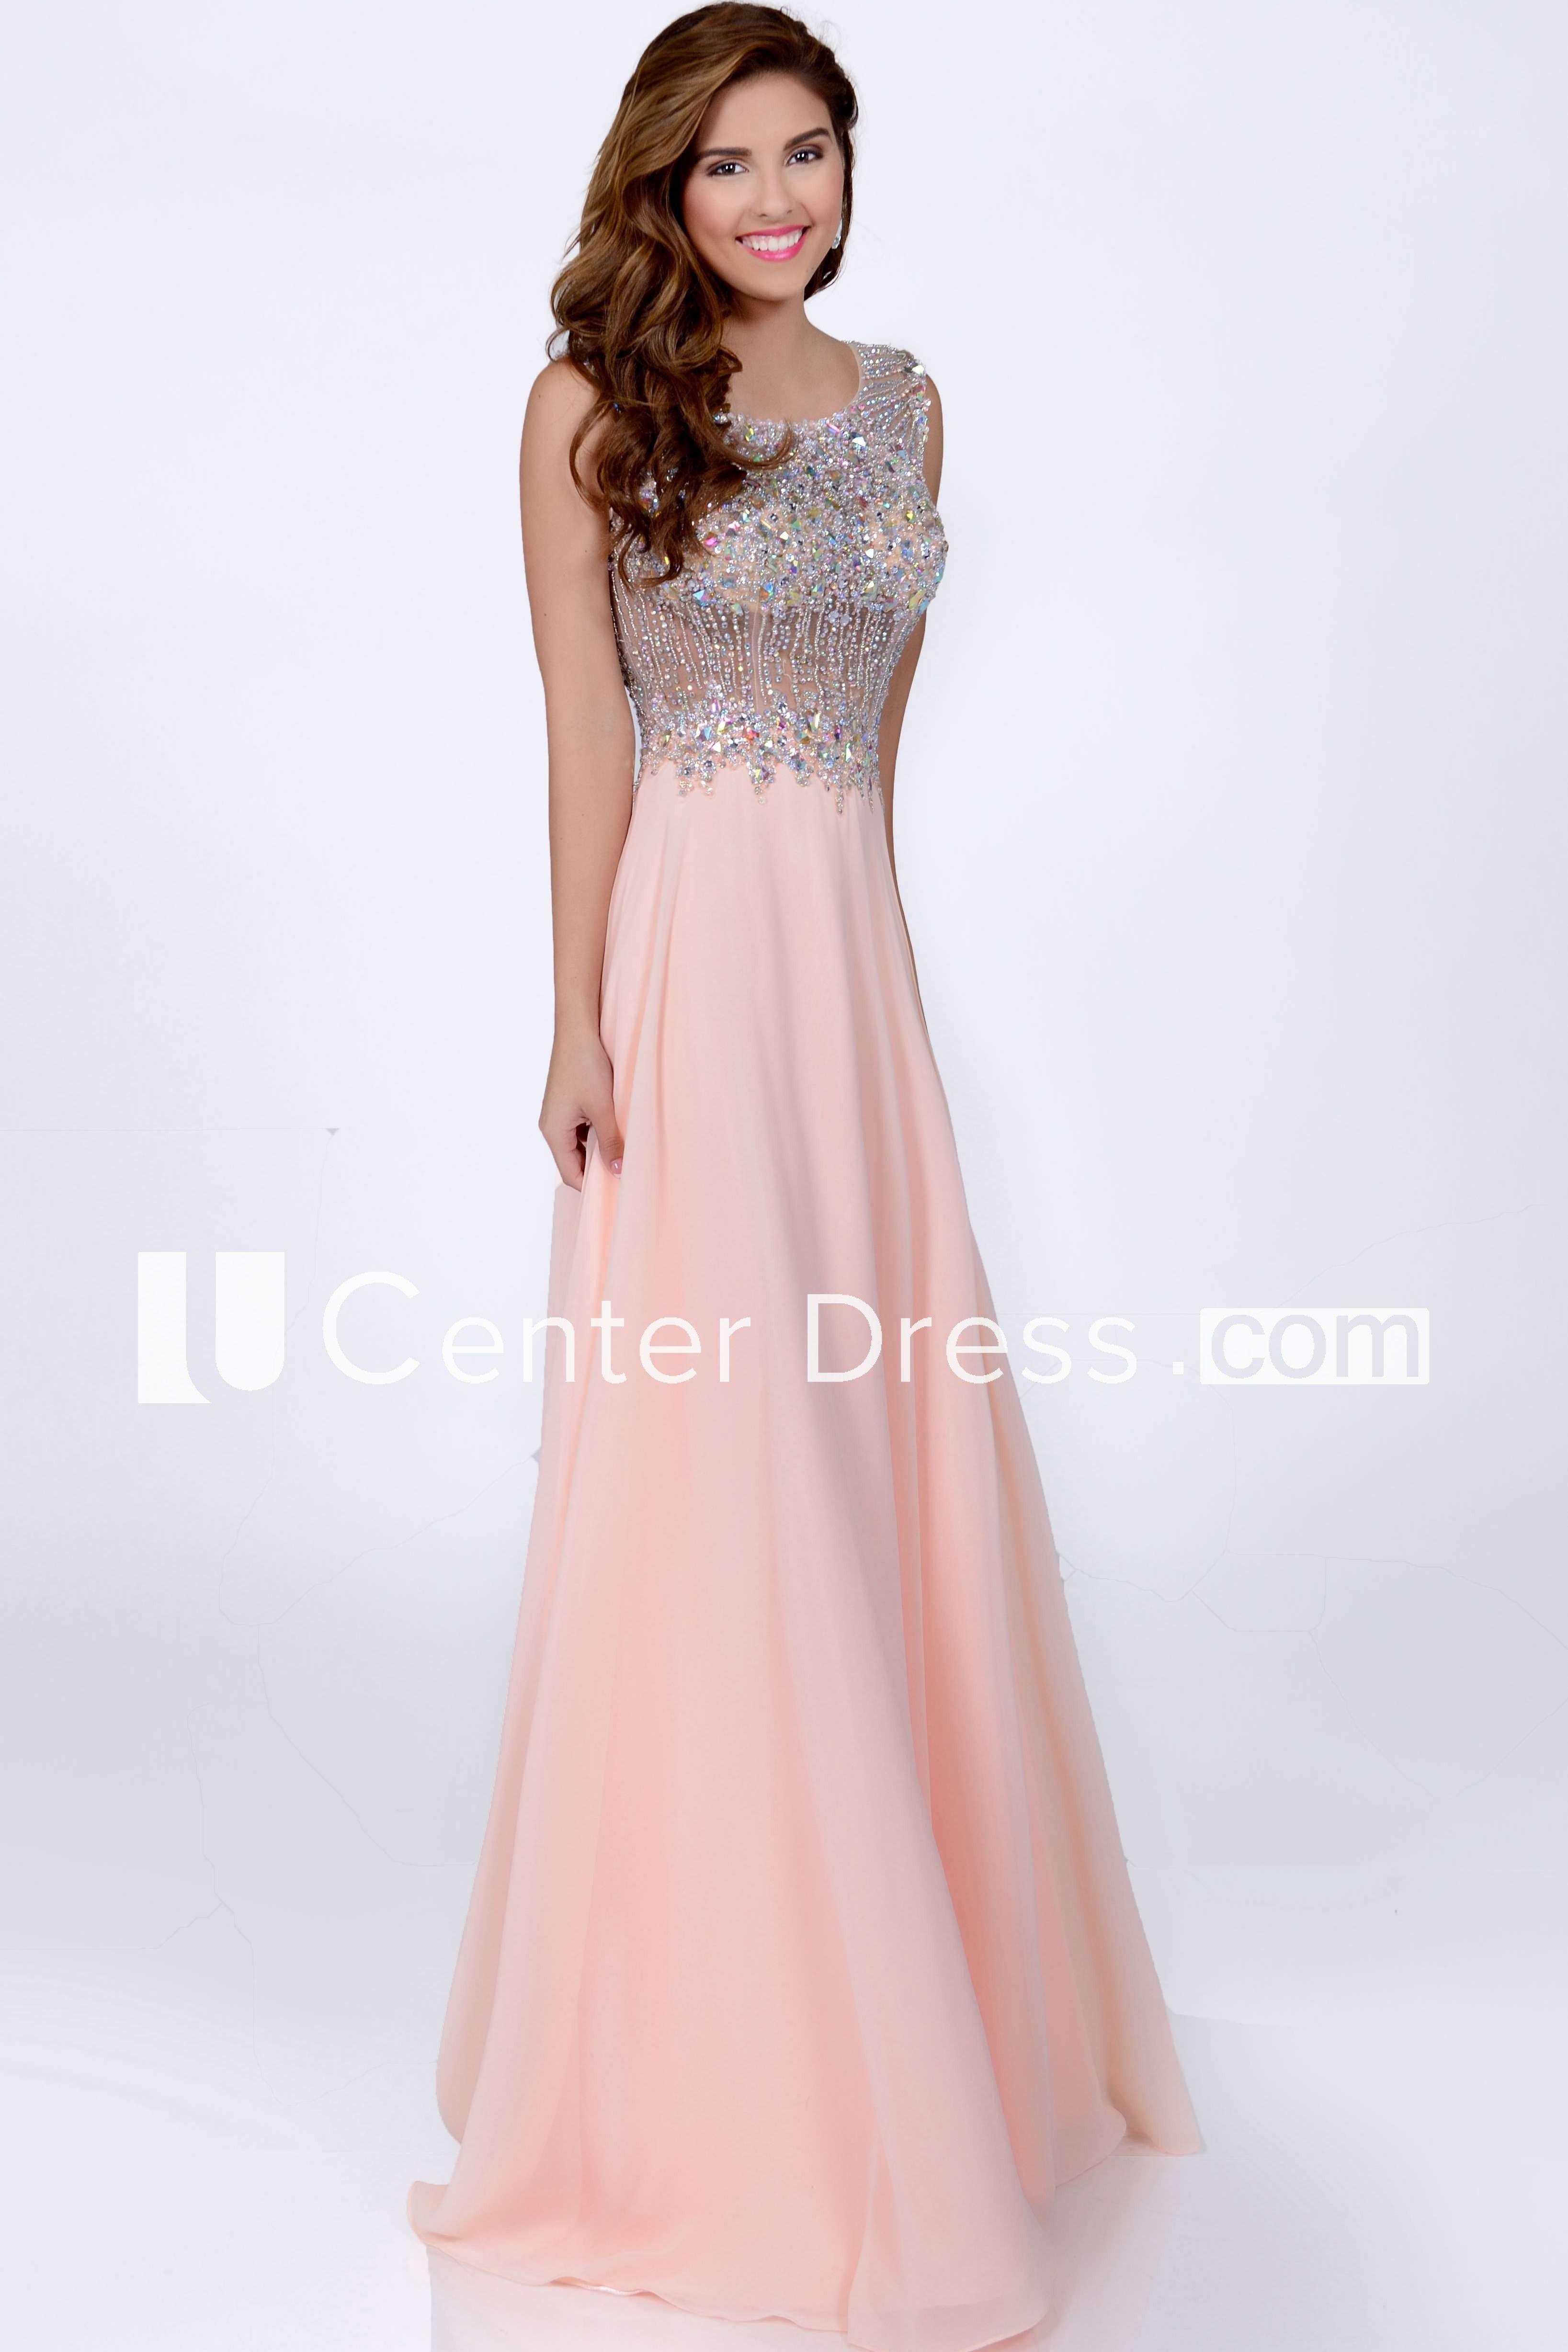 Sleeveless aline bateau neck chiffon prom dress featuring keyhole